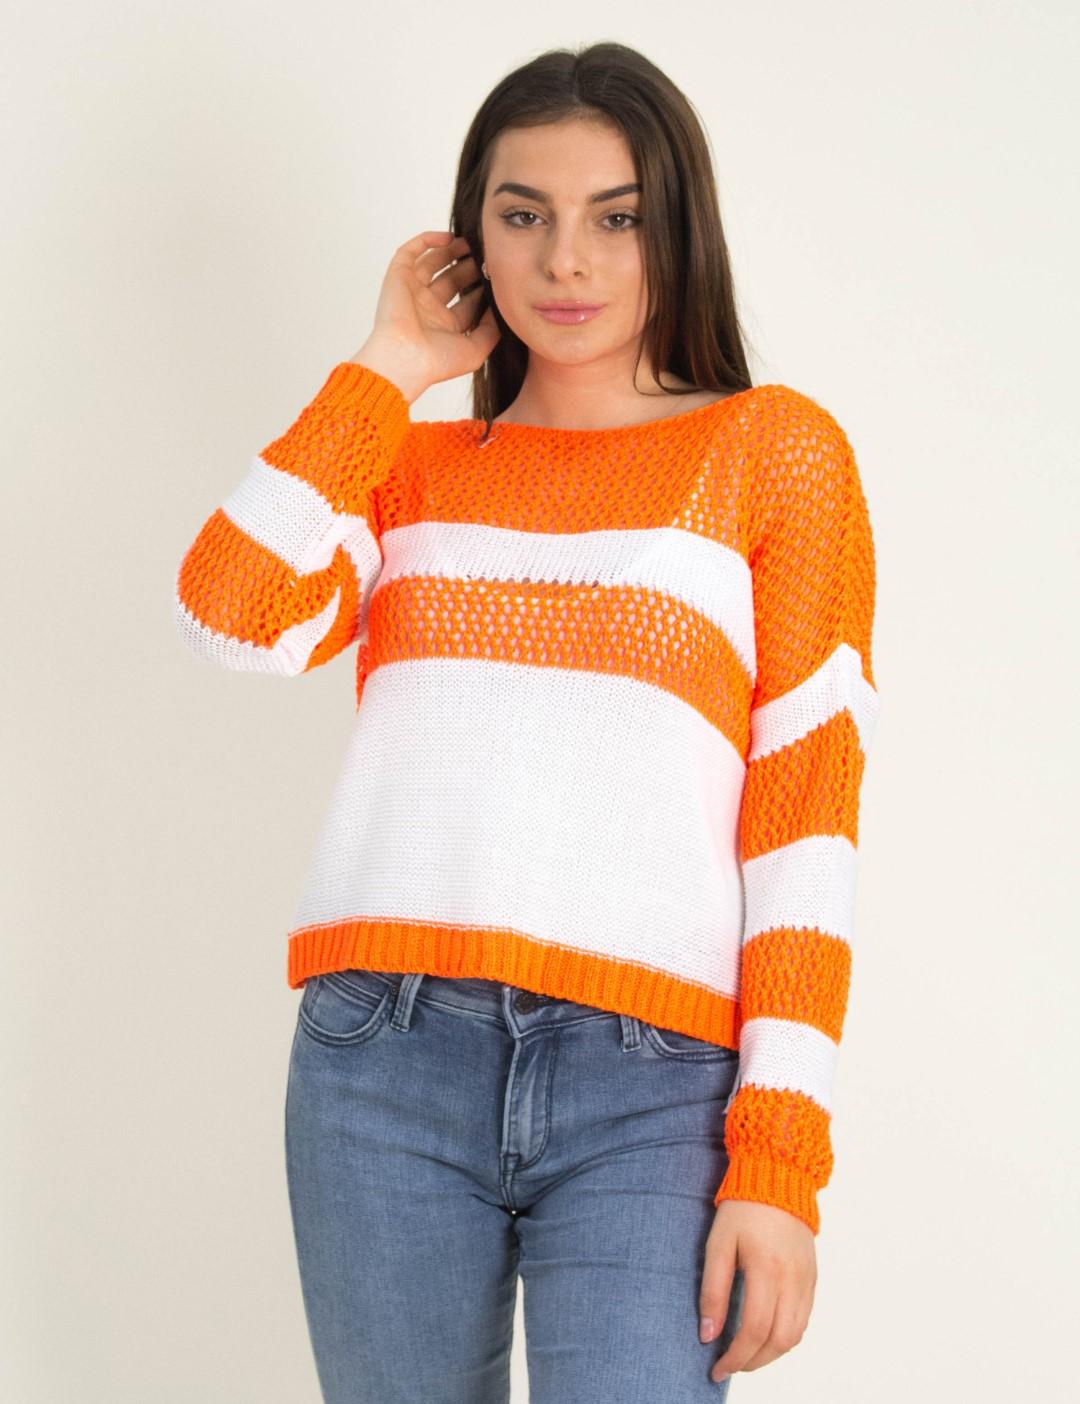 4ac067746888 Γυναικείο πορτοκαλί πλεκτό Crop Top ριγέ YC66R